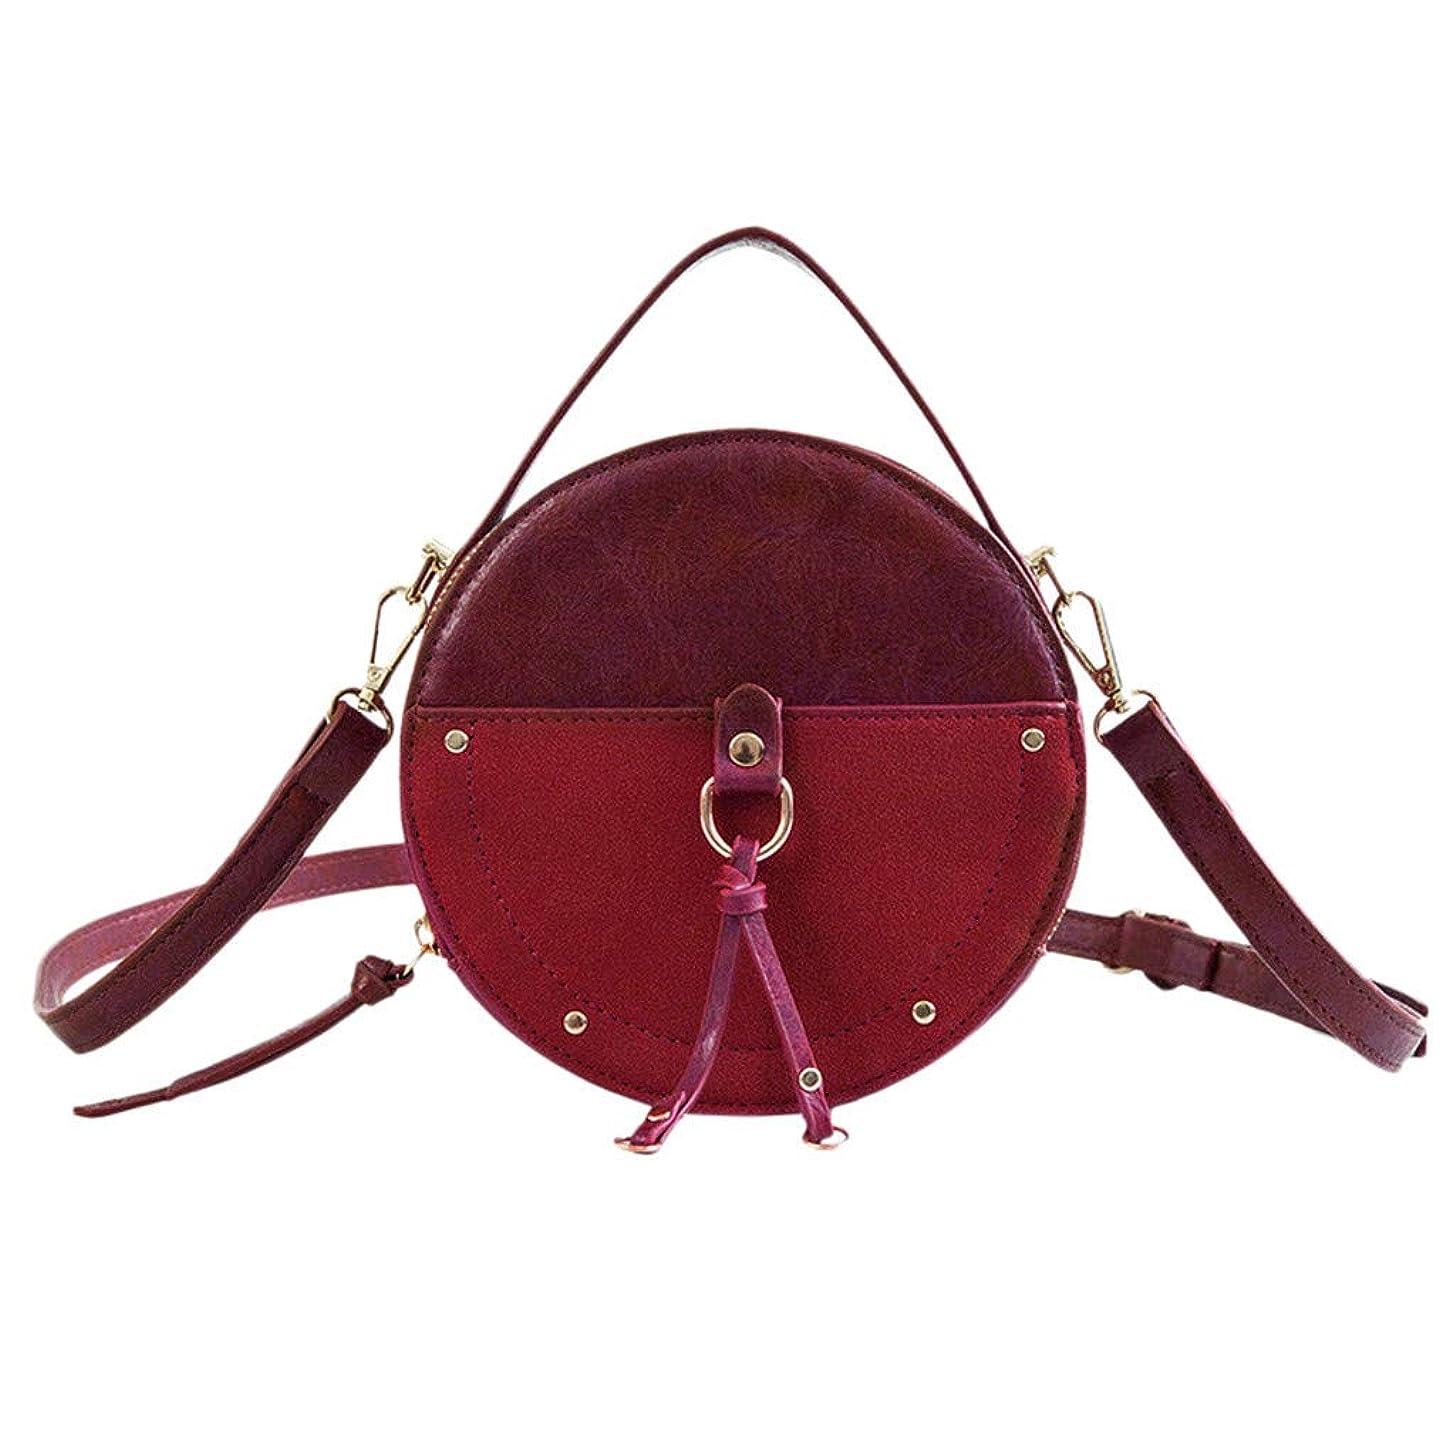 Hot Sale!DDKK bags Women Round Shape Punk Bags Rivet Shoulder Crossbody Bag Handbag Top Handle Bag Purse Portable Wild Bag-Pu Leather